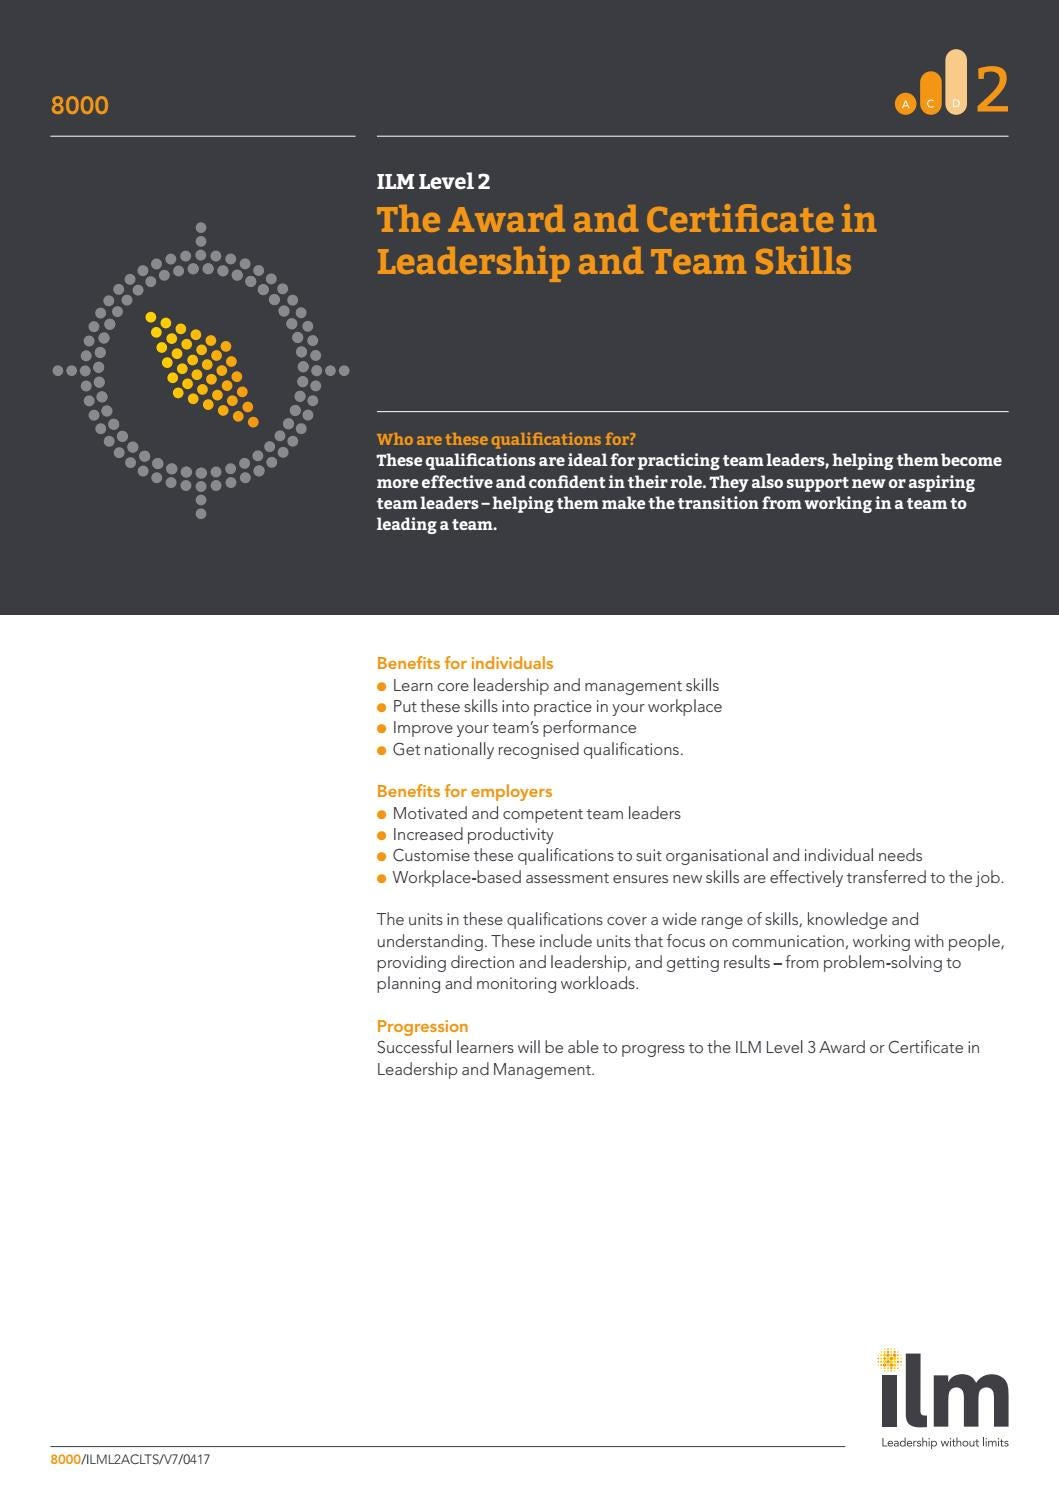 ILM Level 2 by LearningTree International - issuu